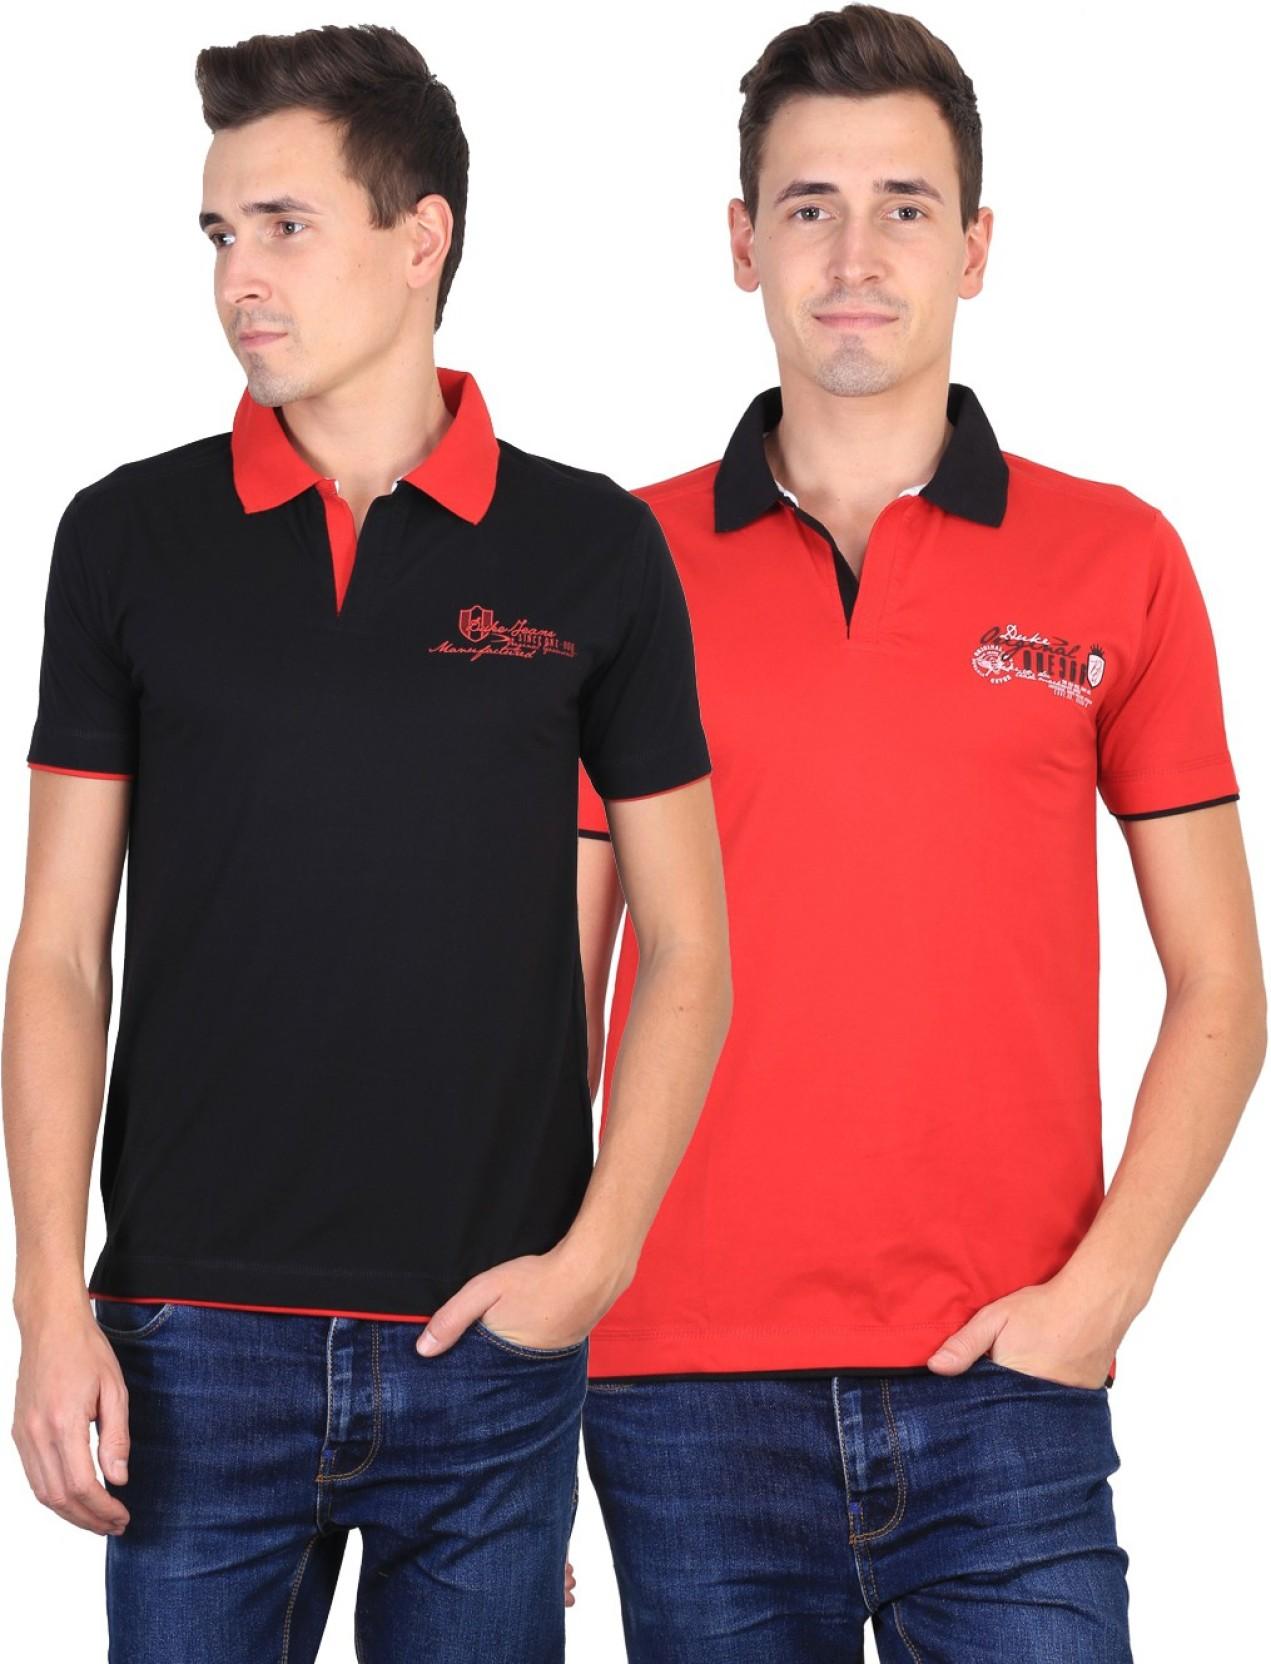 874e21a98 Buy Duke Pack Of 2 Striped Polo T Shirts - Tshirts ... - Myntra